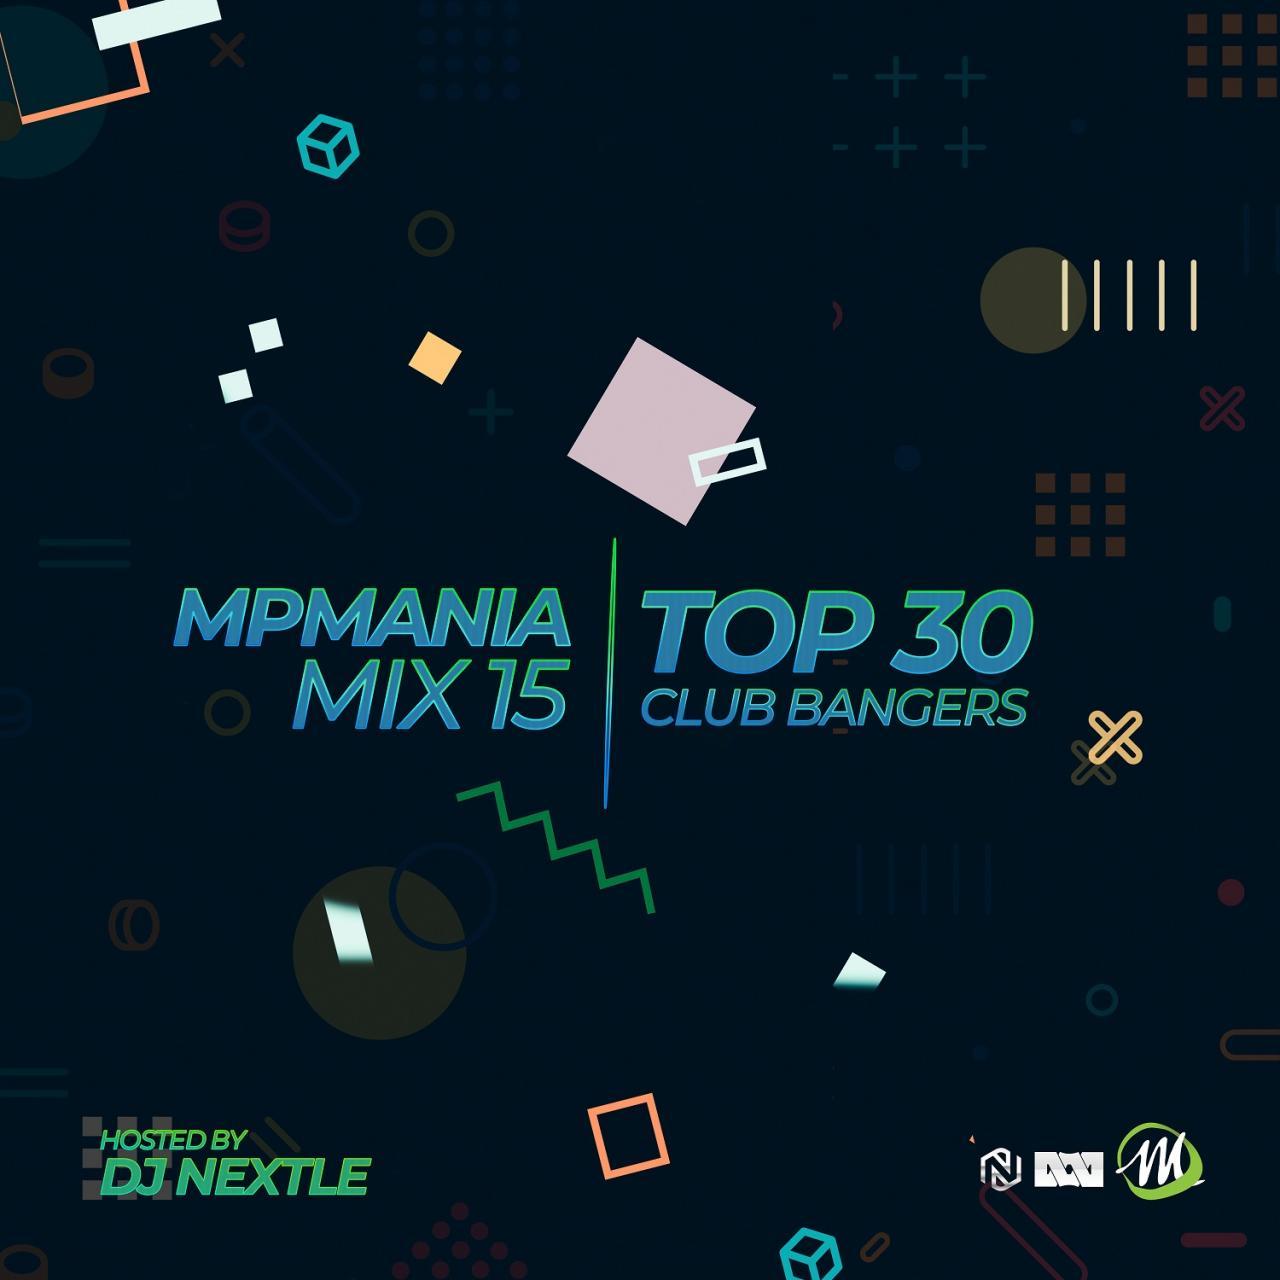 Dj Nextle - MPmania Mix 15 (Top 30 Club Bangers)